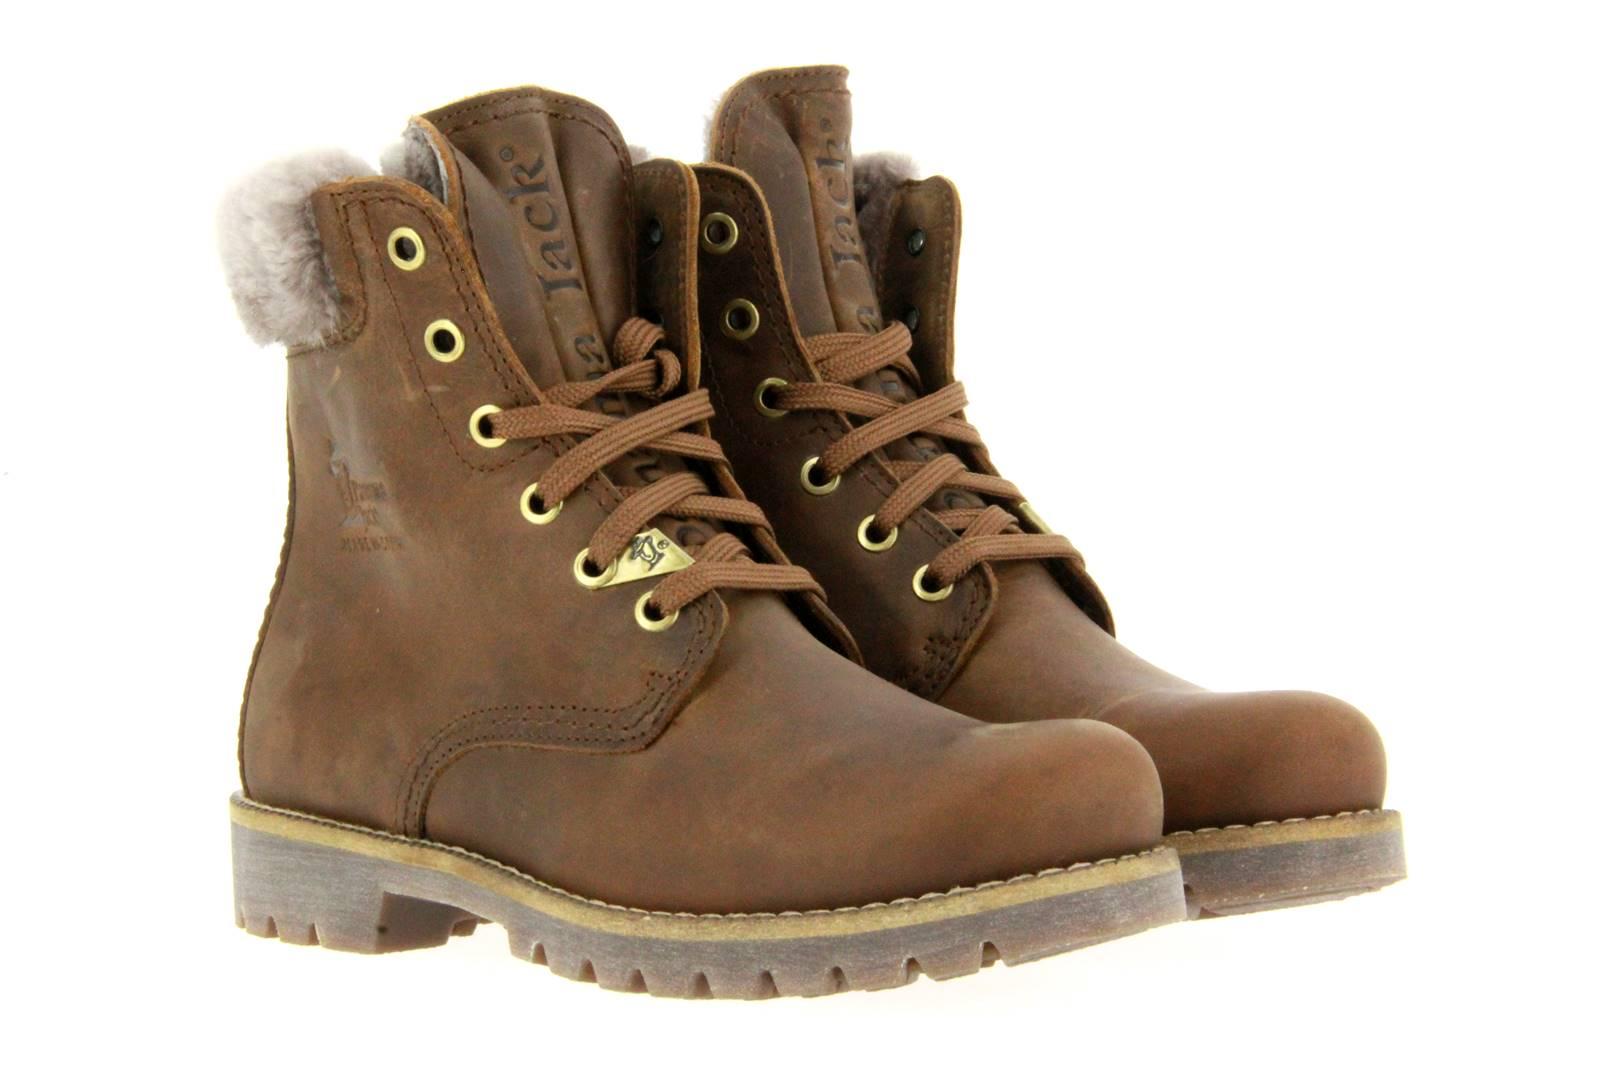 Panama Jack boots lined PANAMA 03 IGLOO NAPA GRASS CUERO BARK